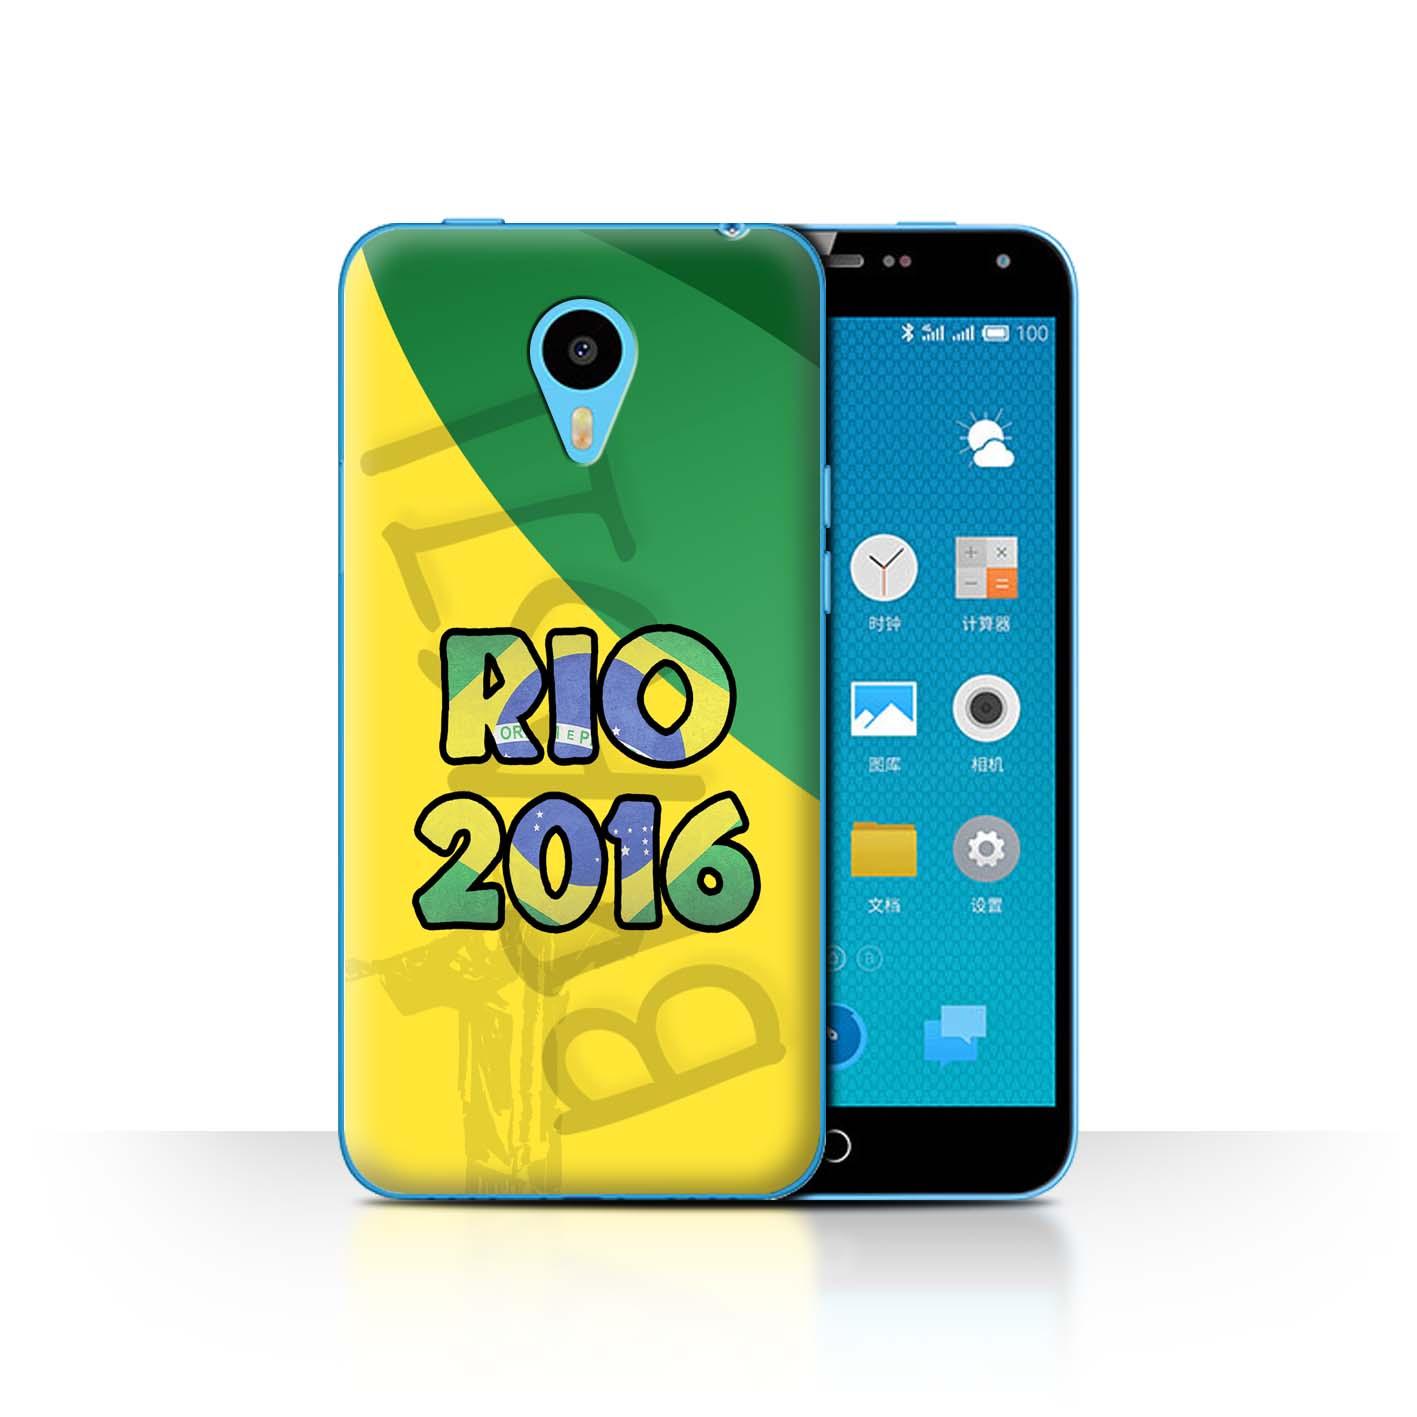 STUFF4-Back-Case-Cover-Skin-for-Meizu-M1N-Brazil-Love-Rio-2016